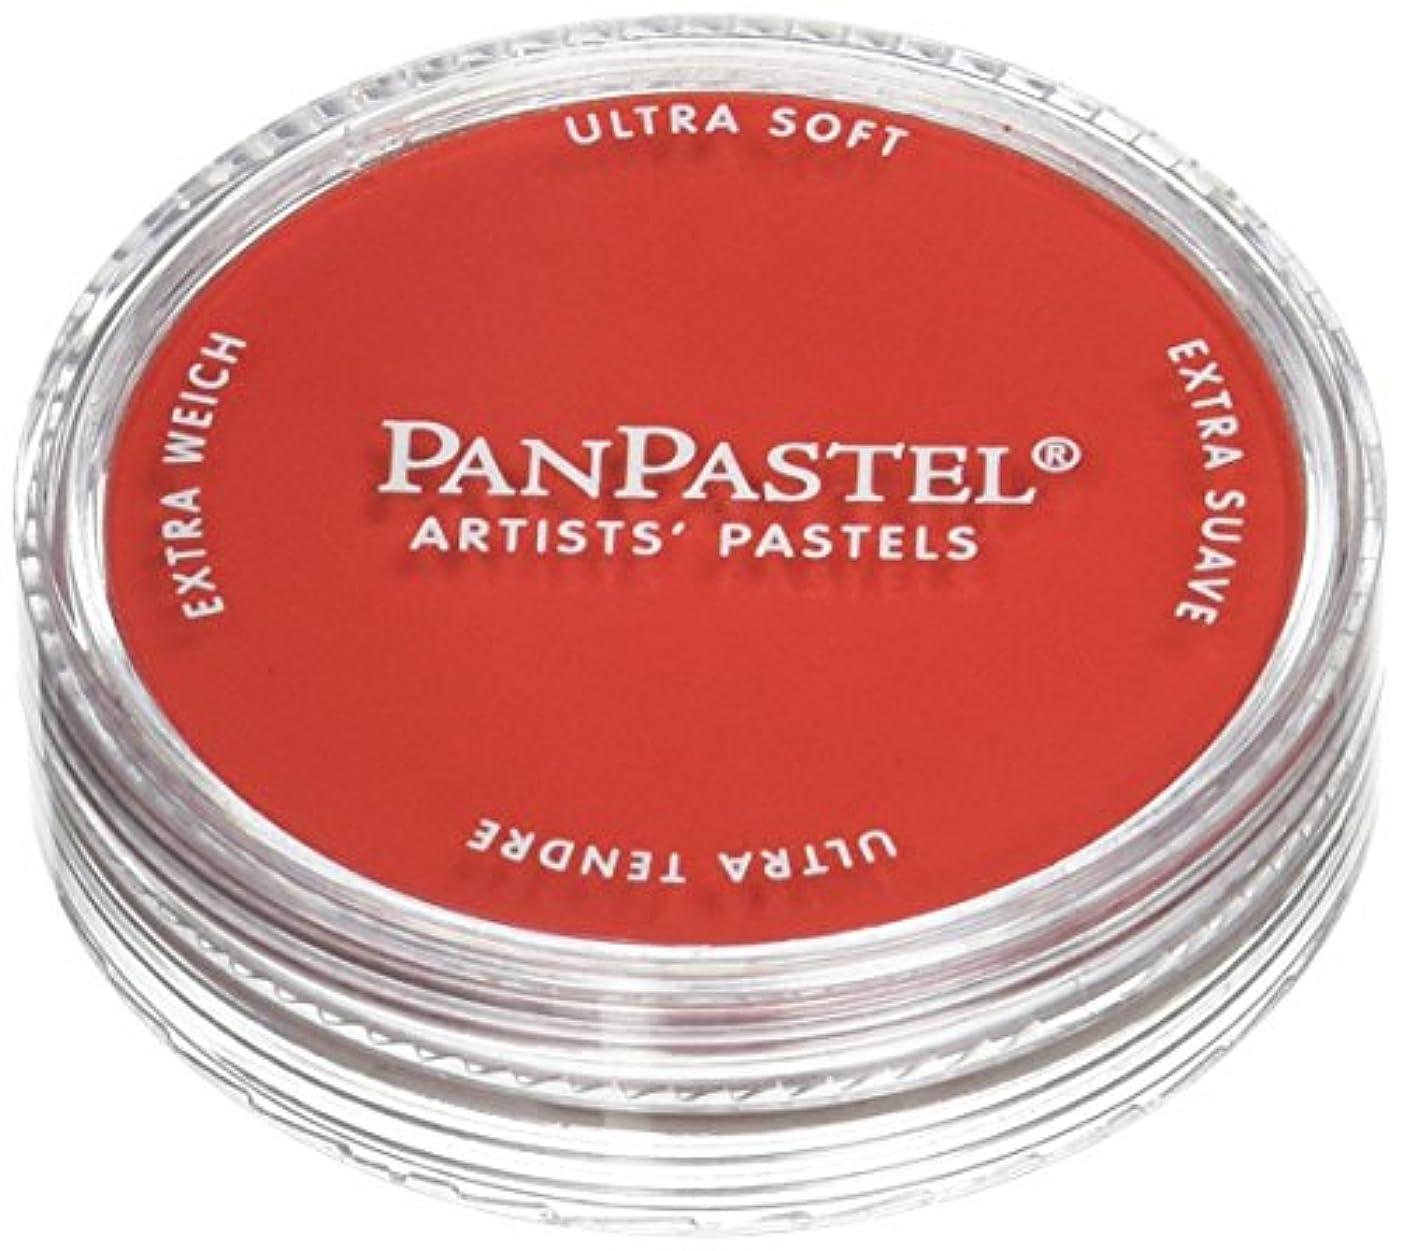 PanPastel Ultra Soft Artist Pastel, Permanent Red